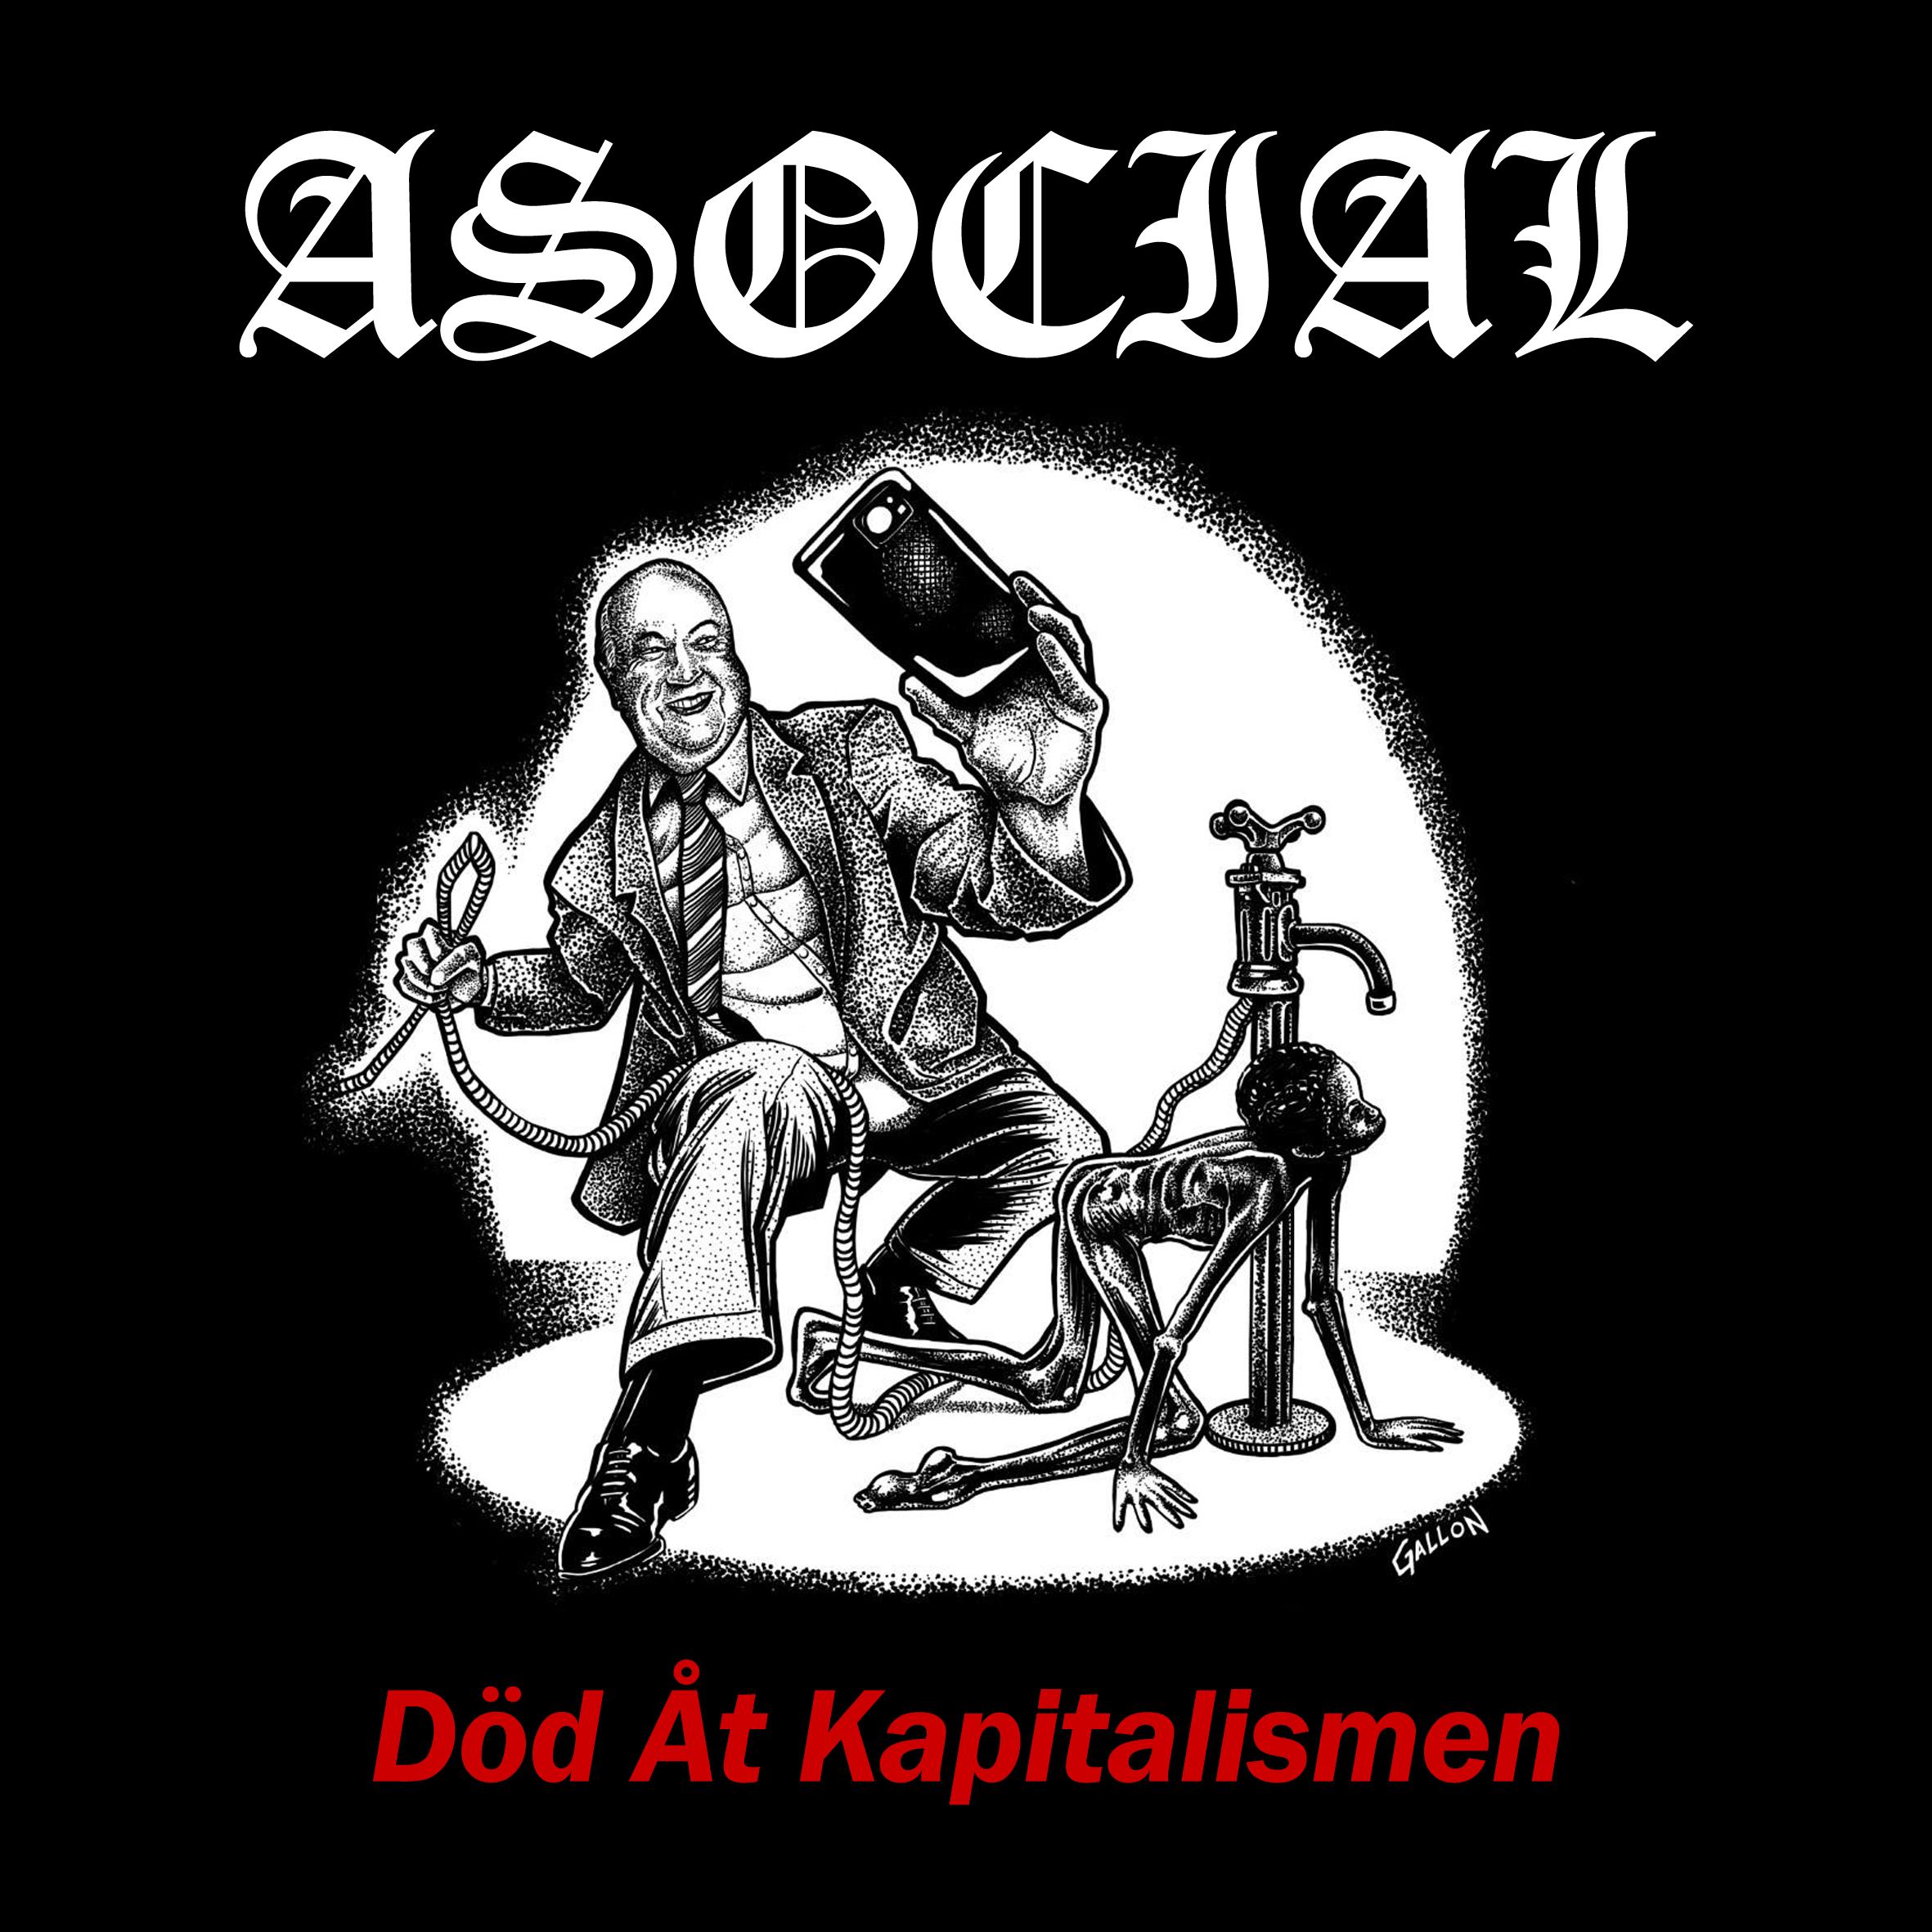 Asocial - Död Åt Kapitalismen - 2019